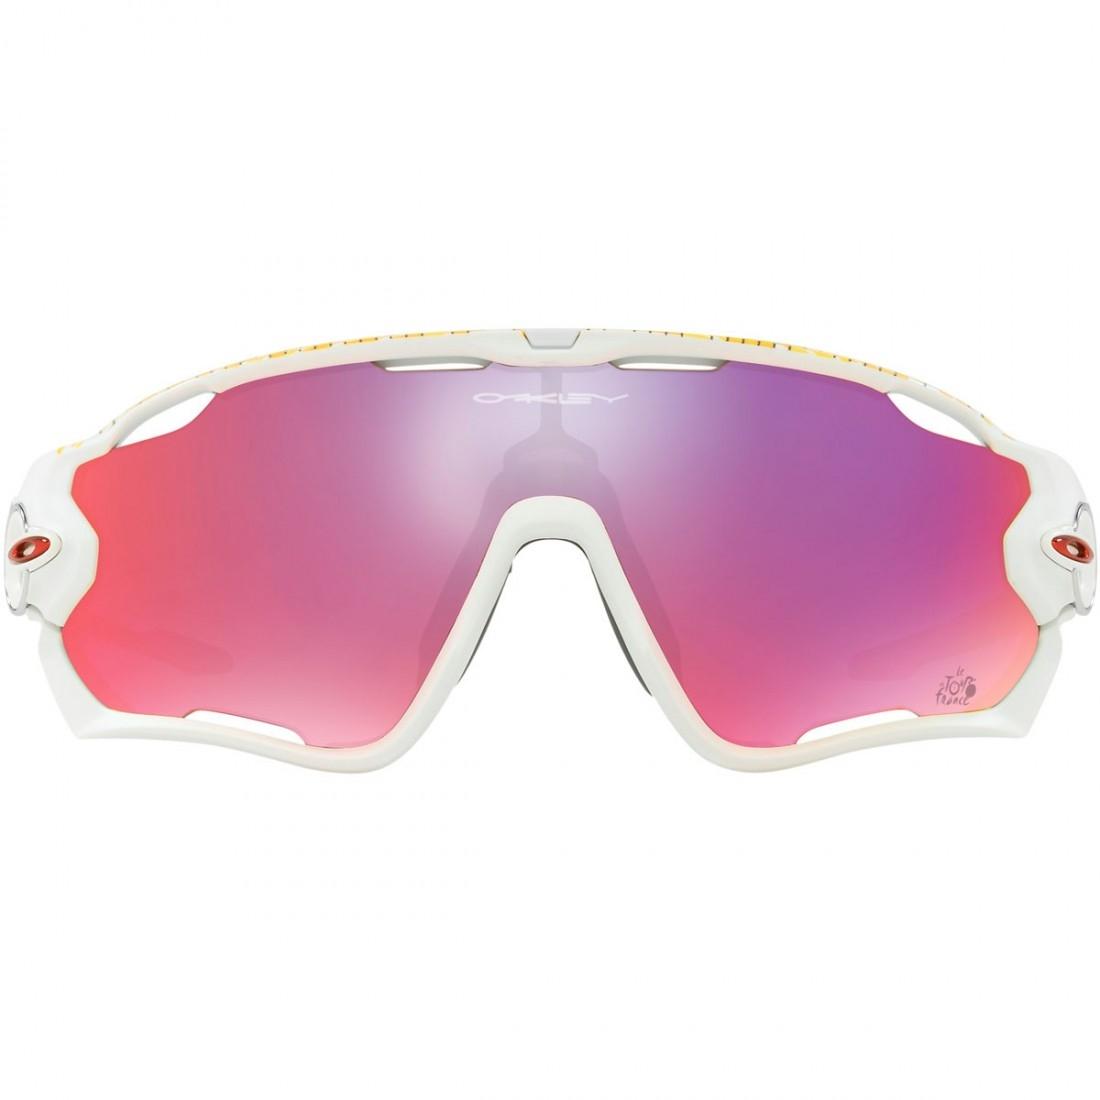 98f4eb1fe0 OAKLEY Jawbreaker Tour de France Matte White   Prizm Road Mask   Goggle